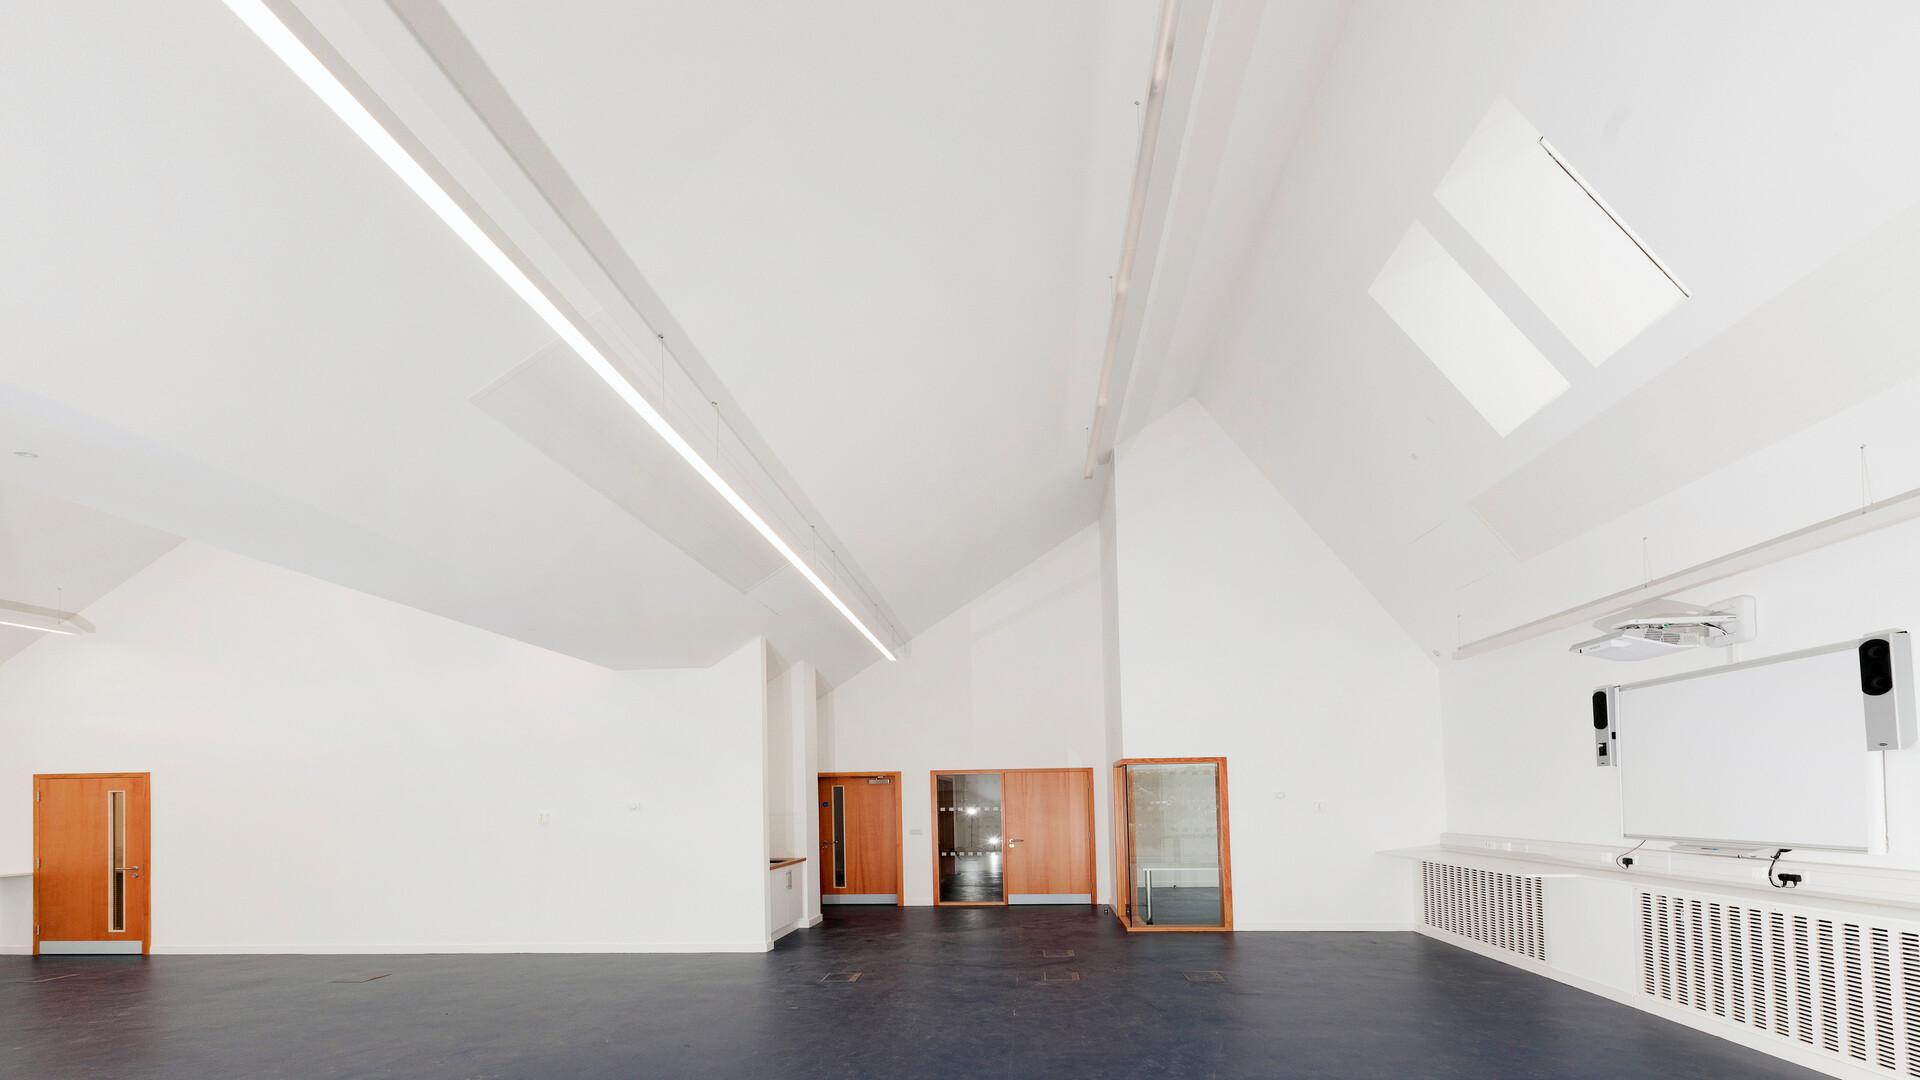 King Edward VI College, UK, Stourbridge, 500m2, Bryant Priest Newman (BPN), King Edward VI College, Pacy & Wheatley, Simon Jones, Mono® Acoustic ceiling system, White